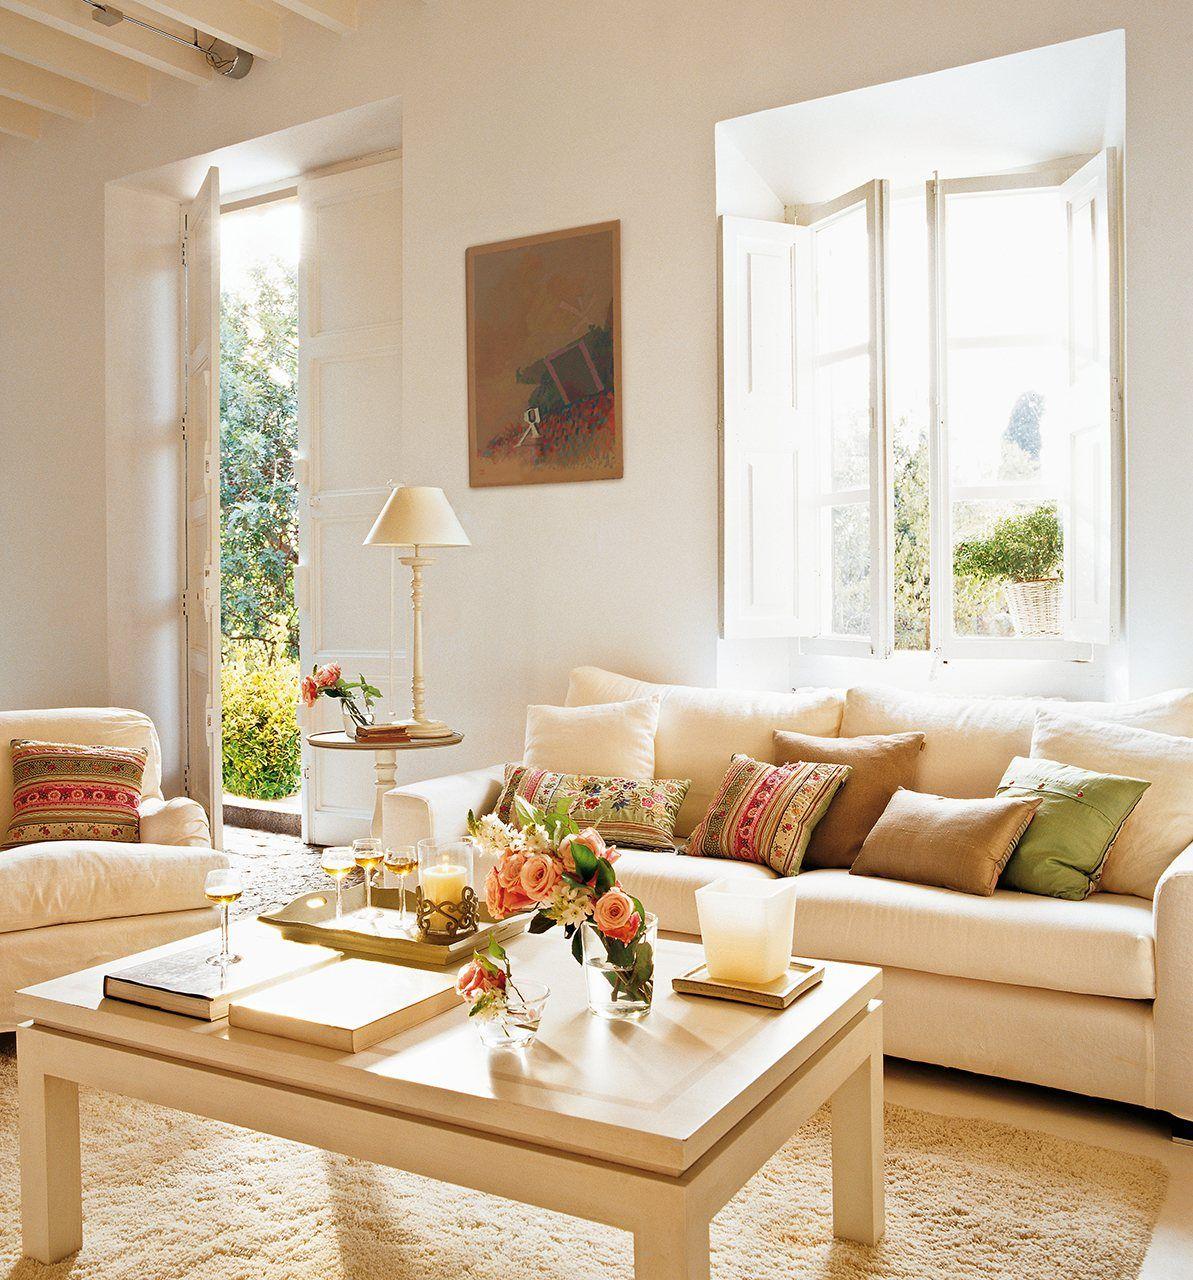 classic | Cute living room, Beige living rooms, Dream ... on Fun Living Room Ideas  id=32172